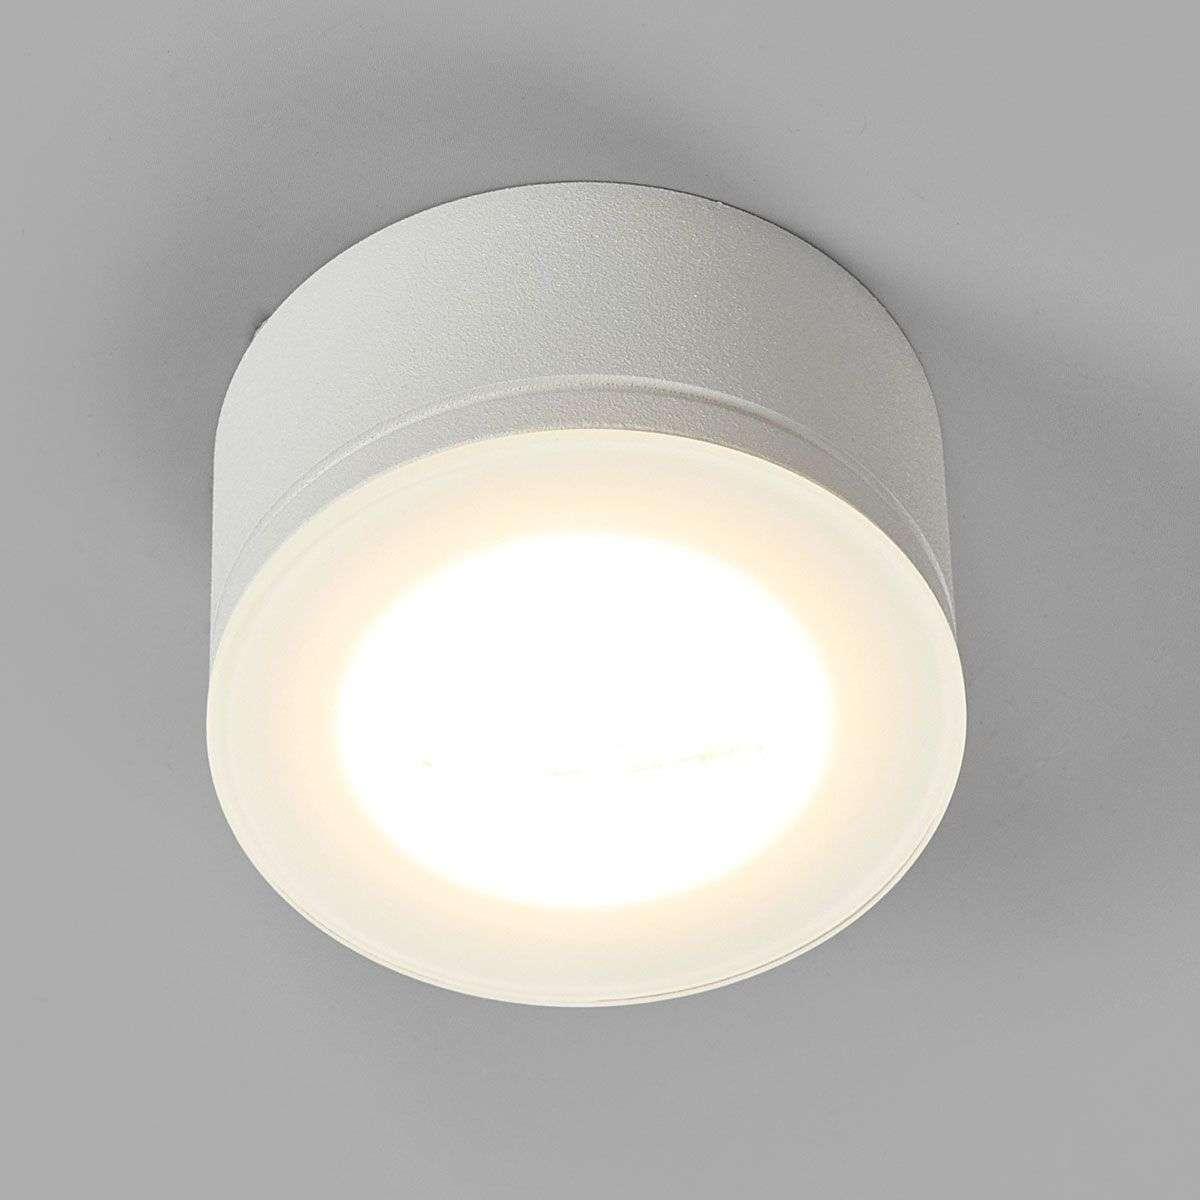 Shop Lights Not Working: Newton 35 LED Ceiling Spotlight F Indoor & Outdoor